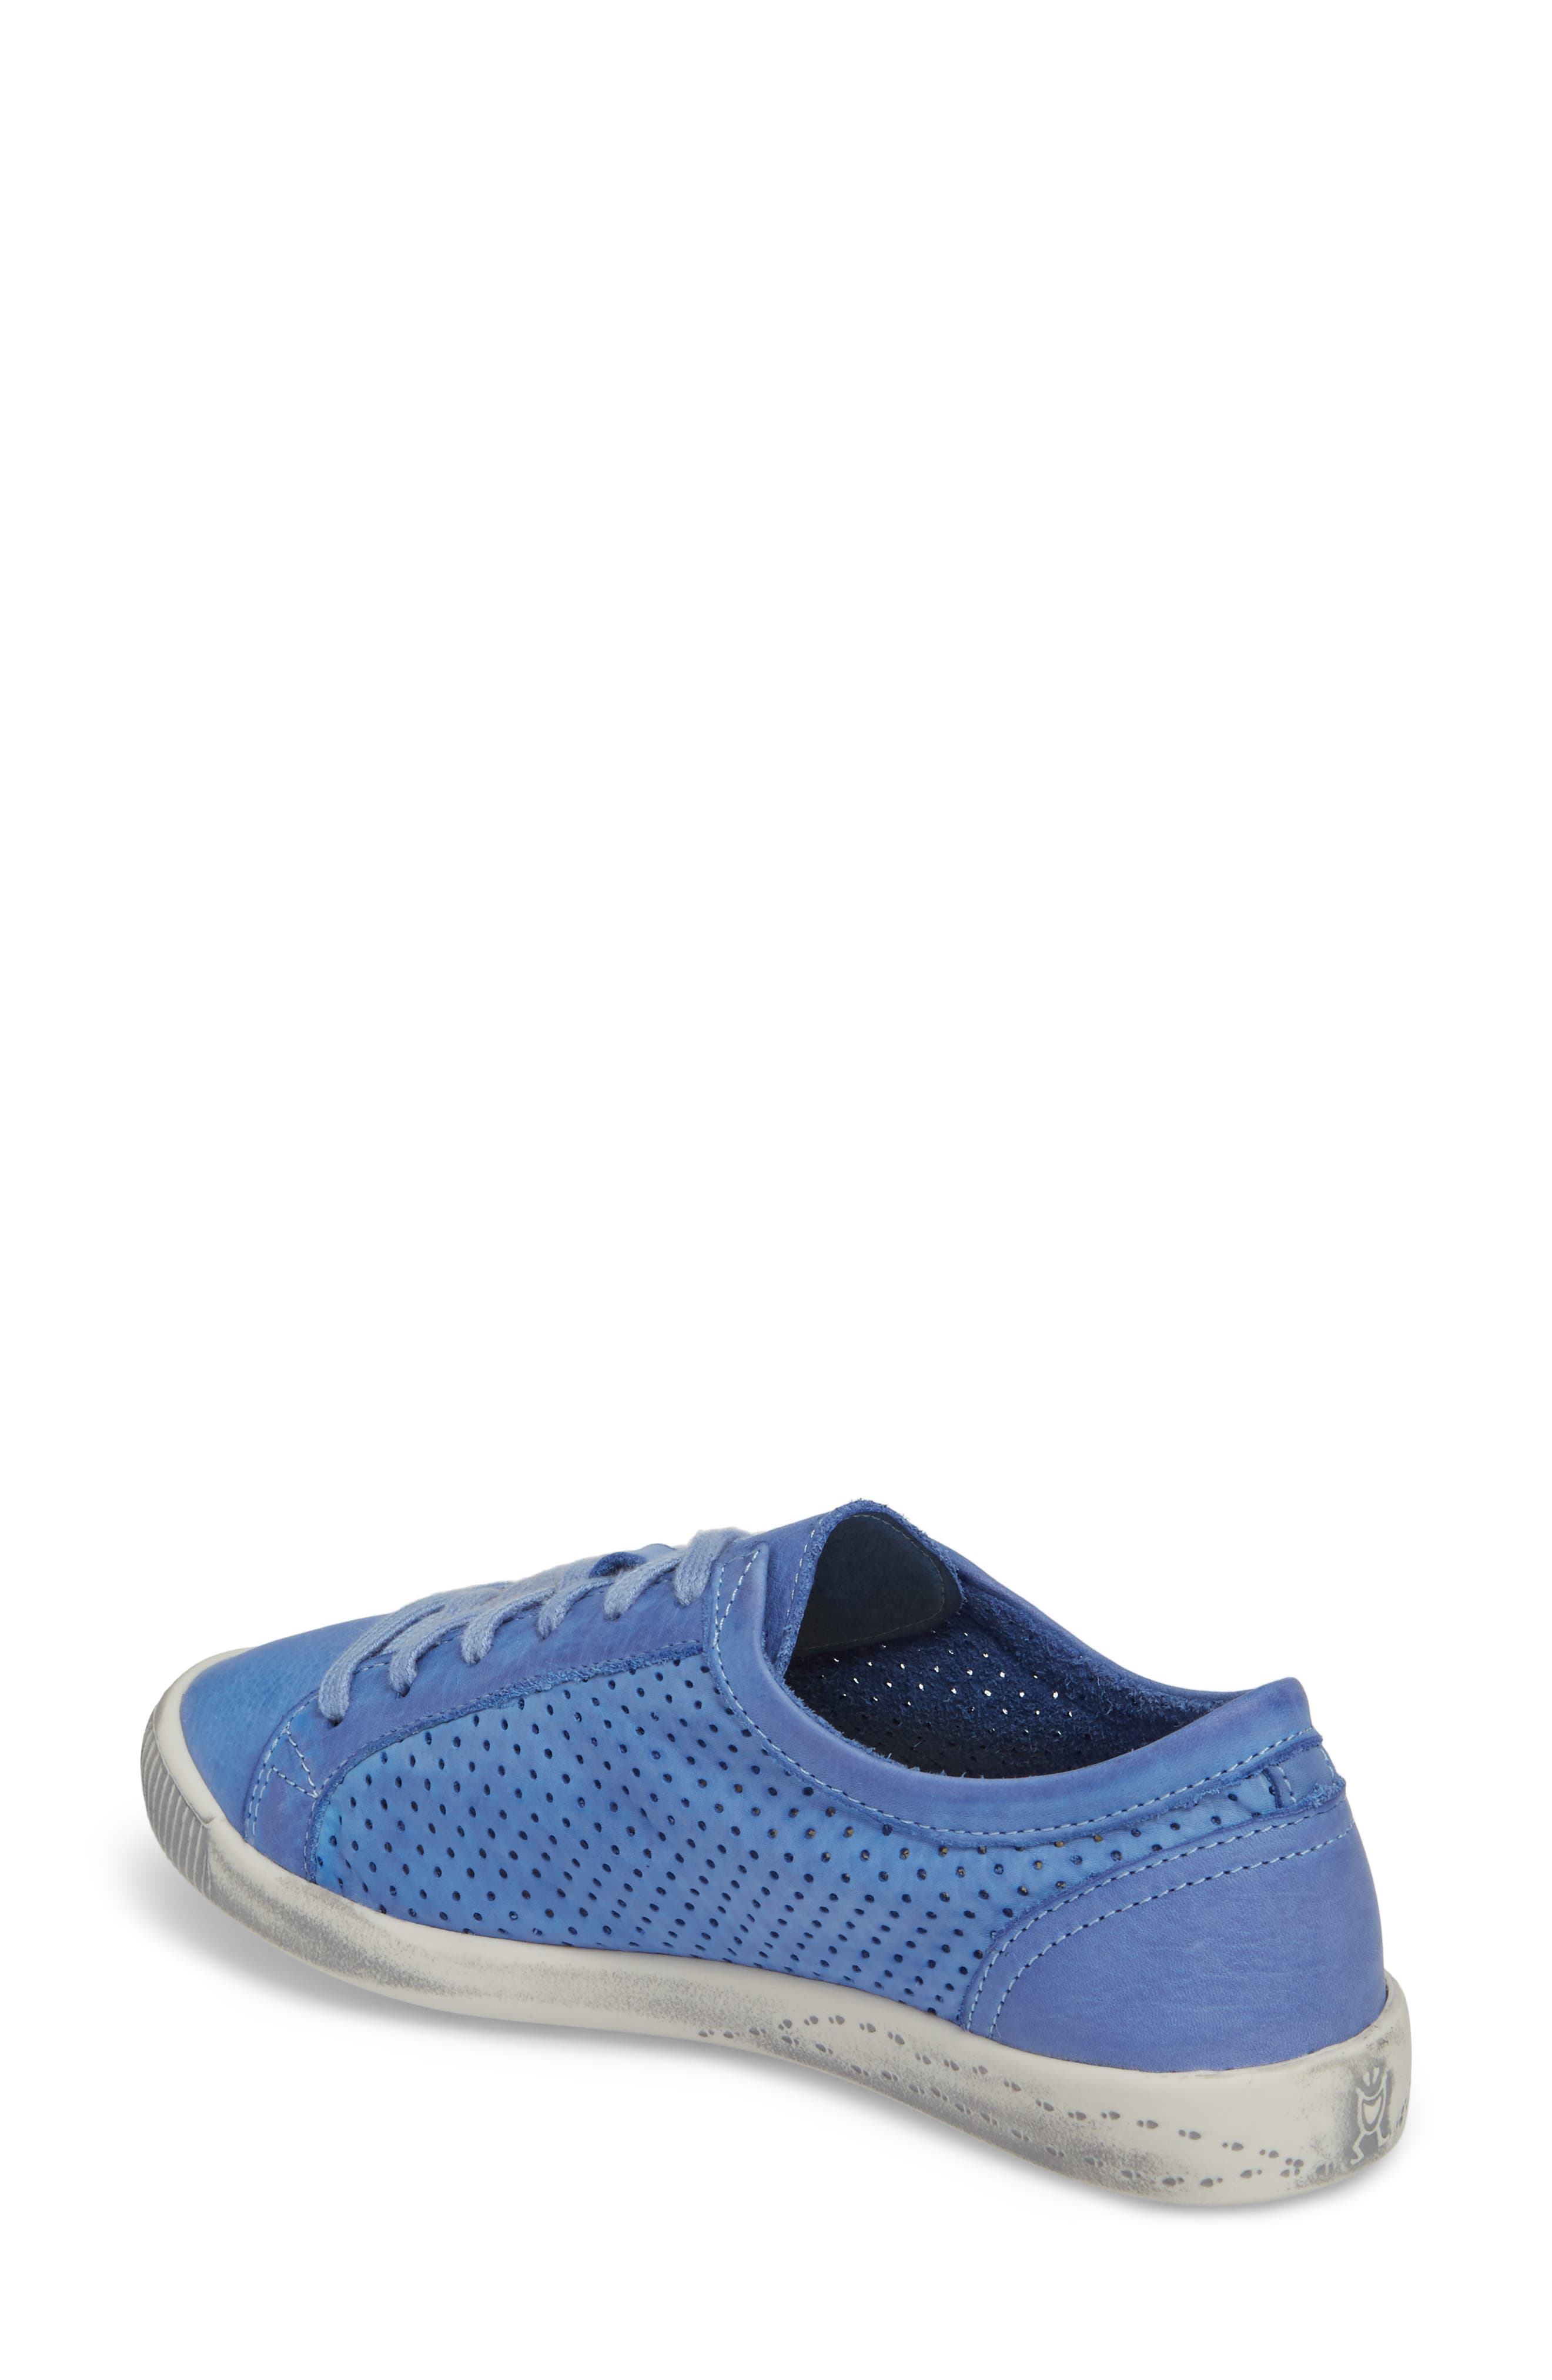 Ica Sneaker,                             Alternate thumbnail 2, color,                             Lavender Leather